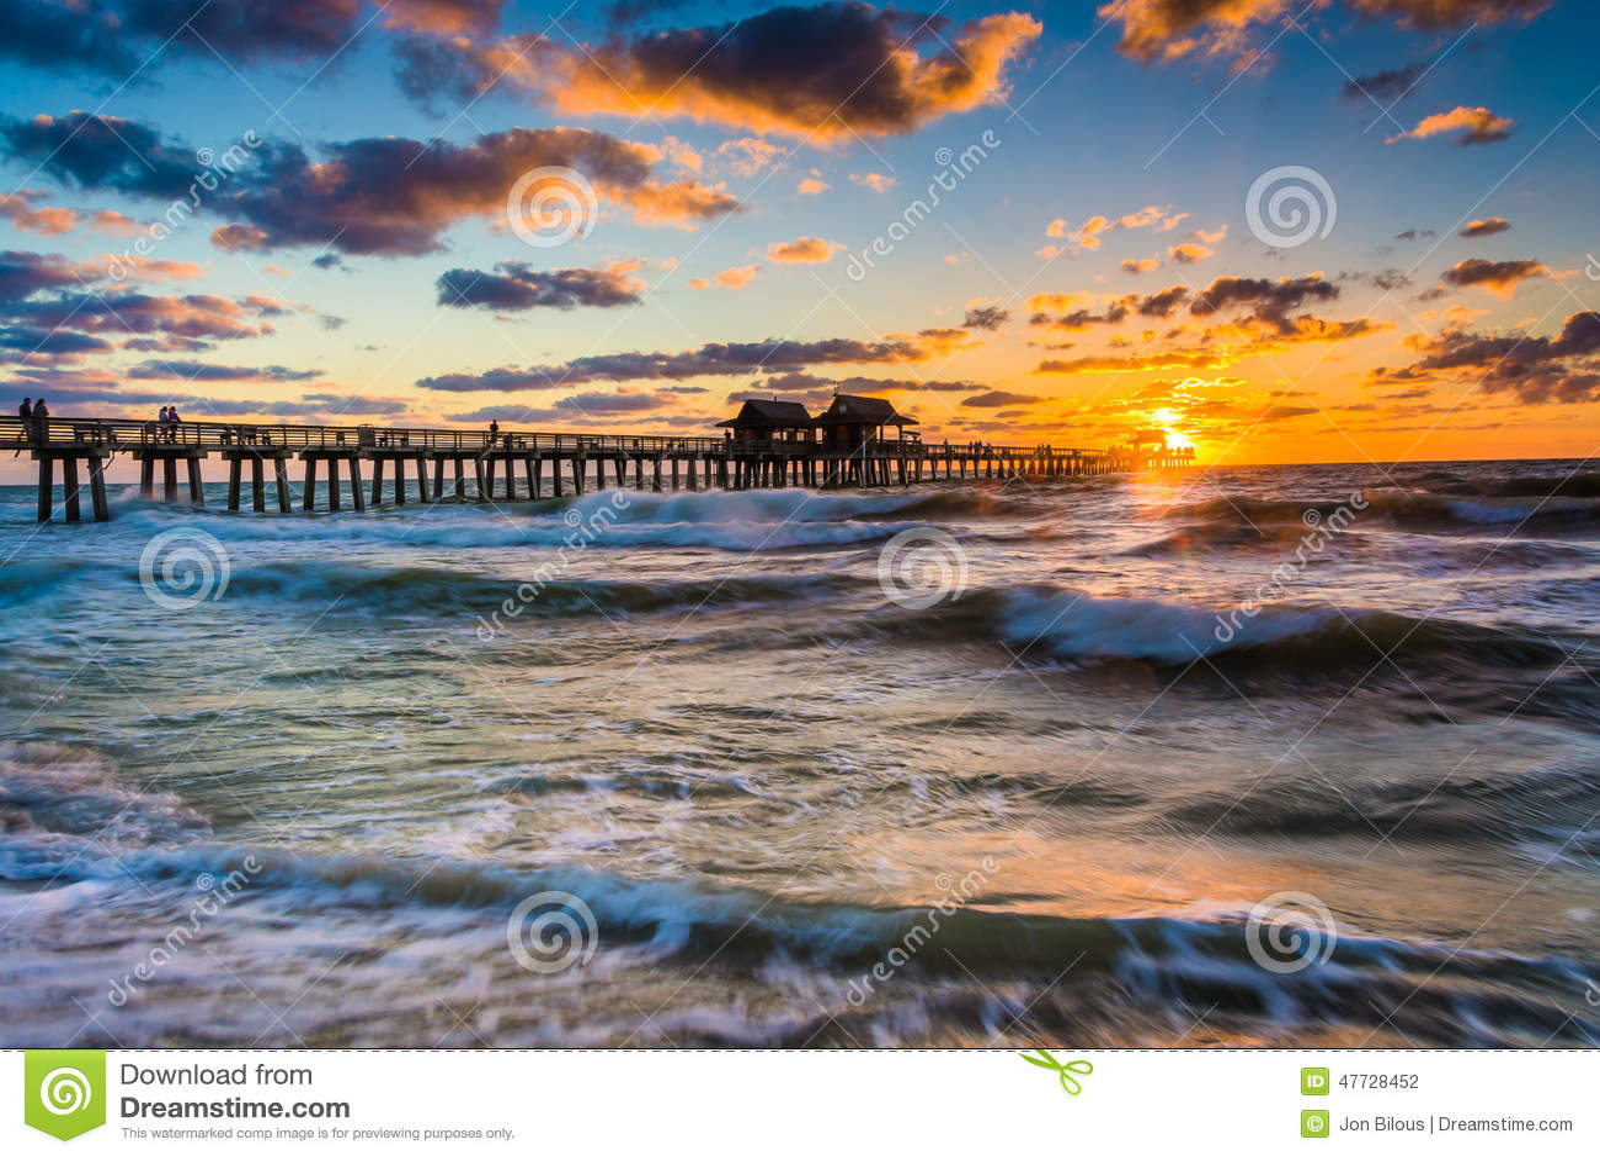 Full House Naples Pier Sunset likewise 3 besides Locationphotodirectlink G34467 I16888923 Naples florida furthermore 3 Red Orange Beach Sunset Eszra Tanner besides E2c500741. on naples florida pier sunset